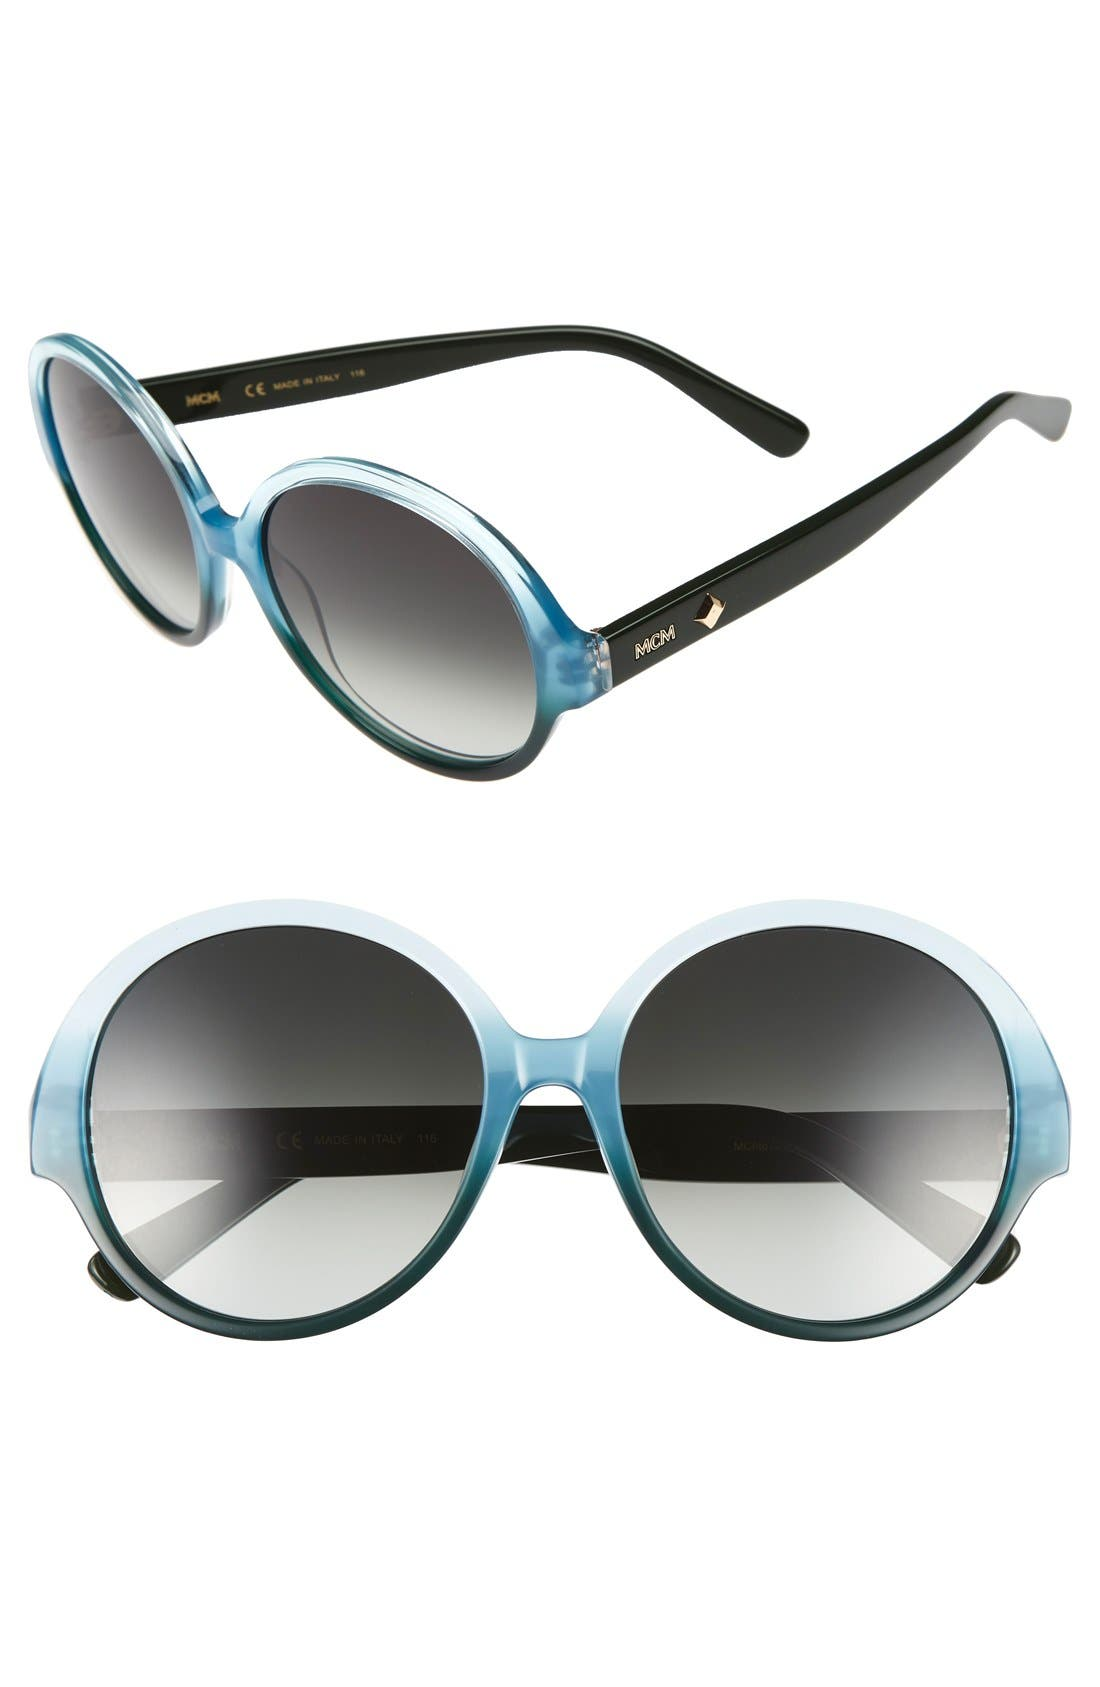 MCM 58mm Round Sunglasses